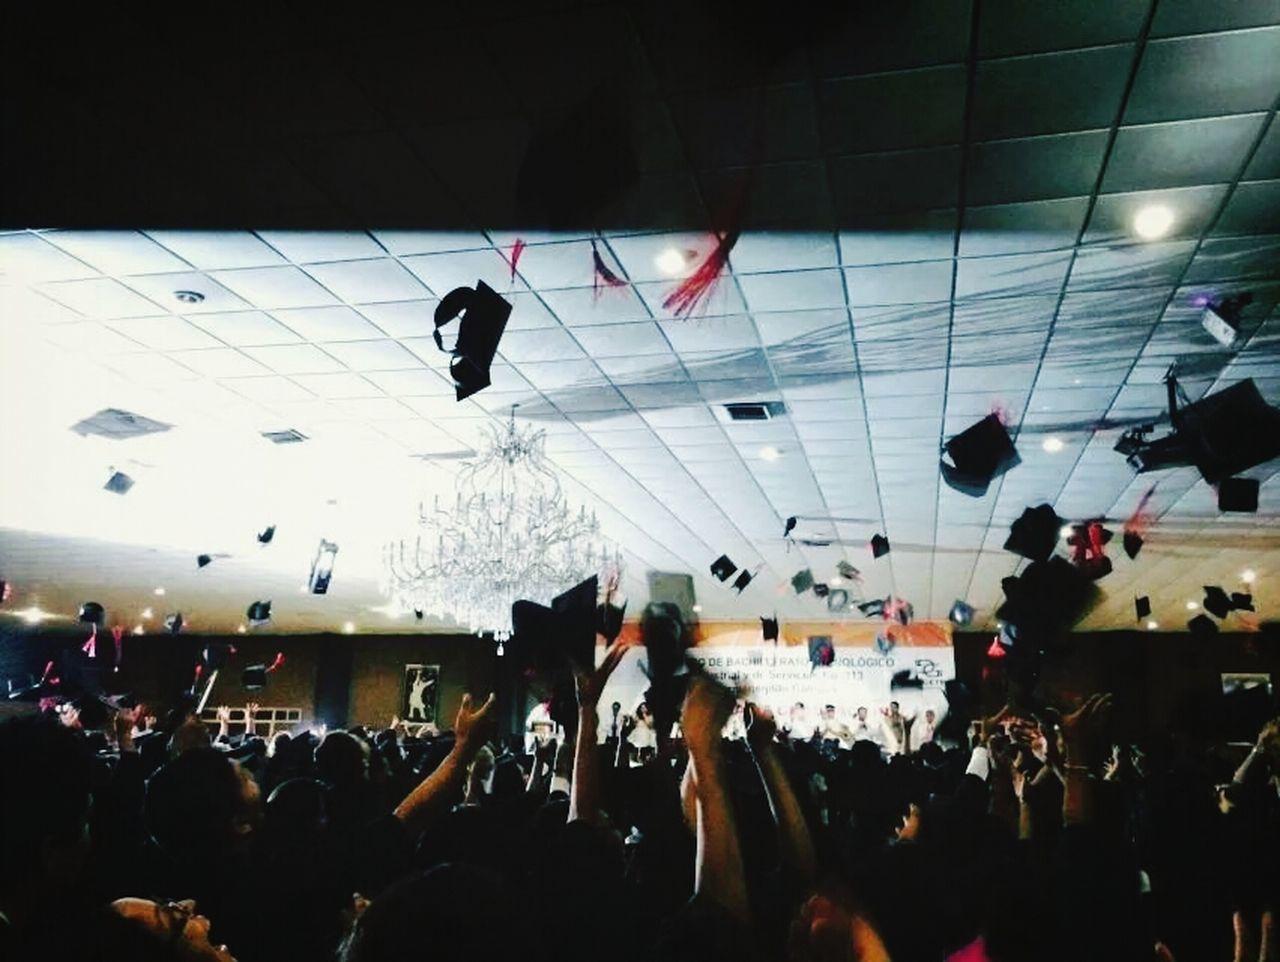 YOLO ✌ Prom Graduation Graduacion cool but weird